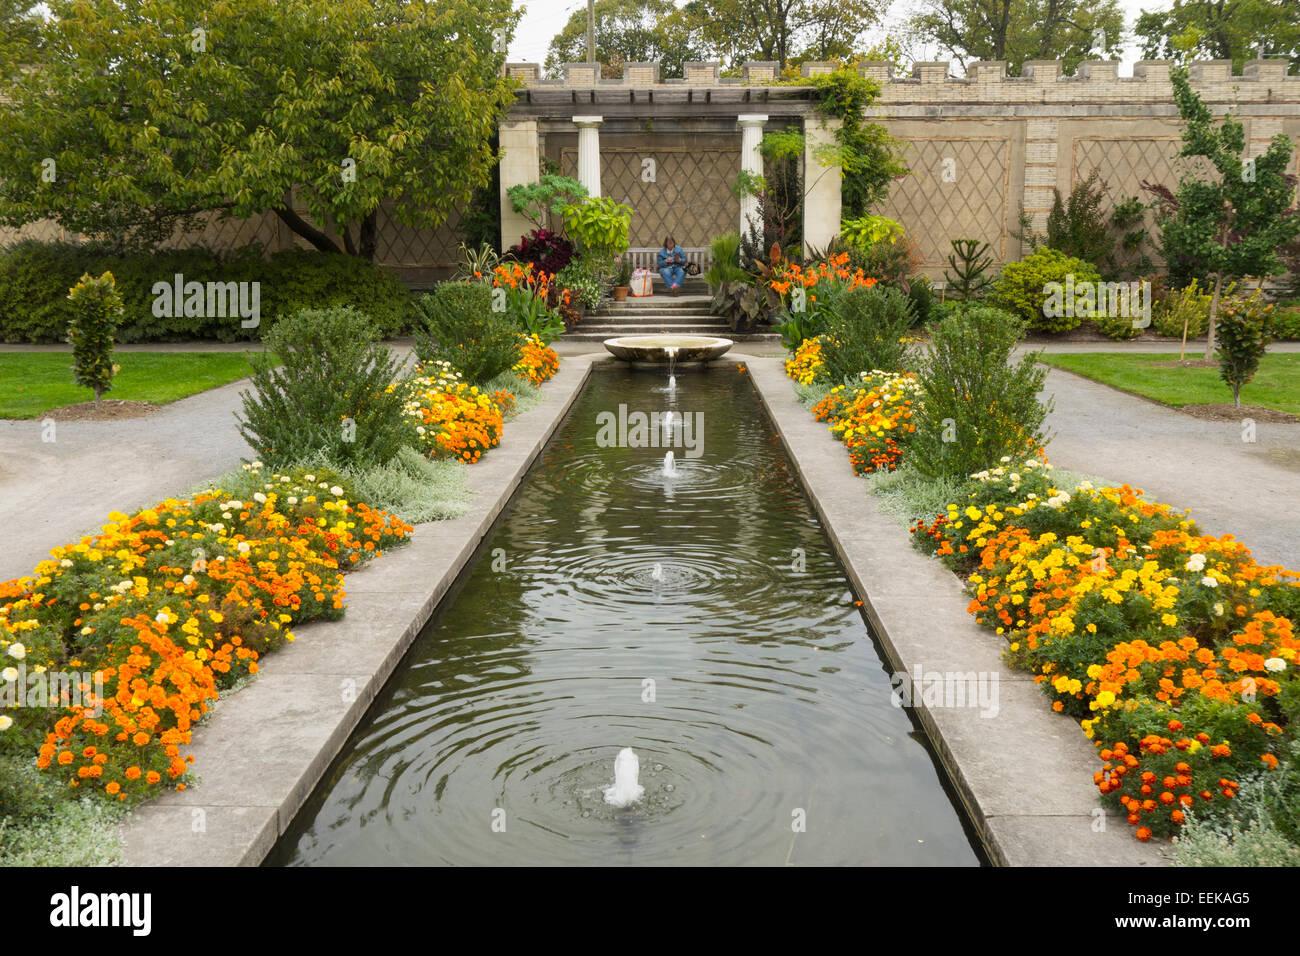 Untermyer Gardens Conservancy In Yonkers Ny Stock Photo 77872037